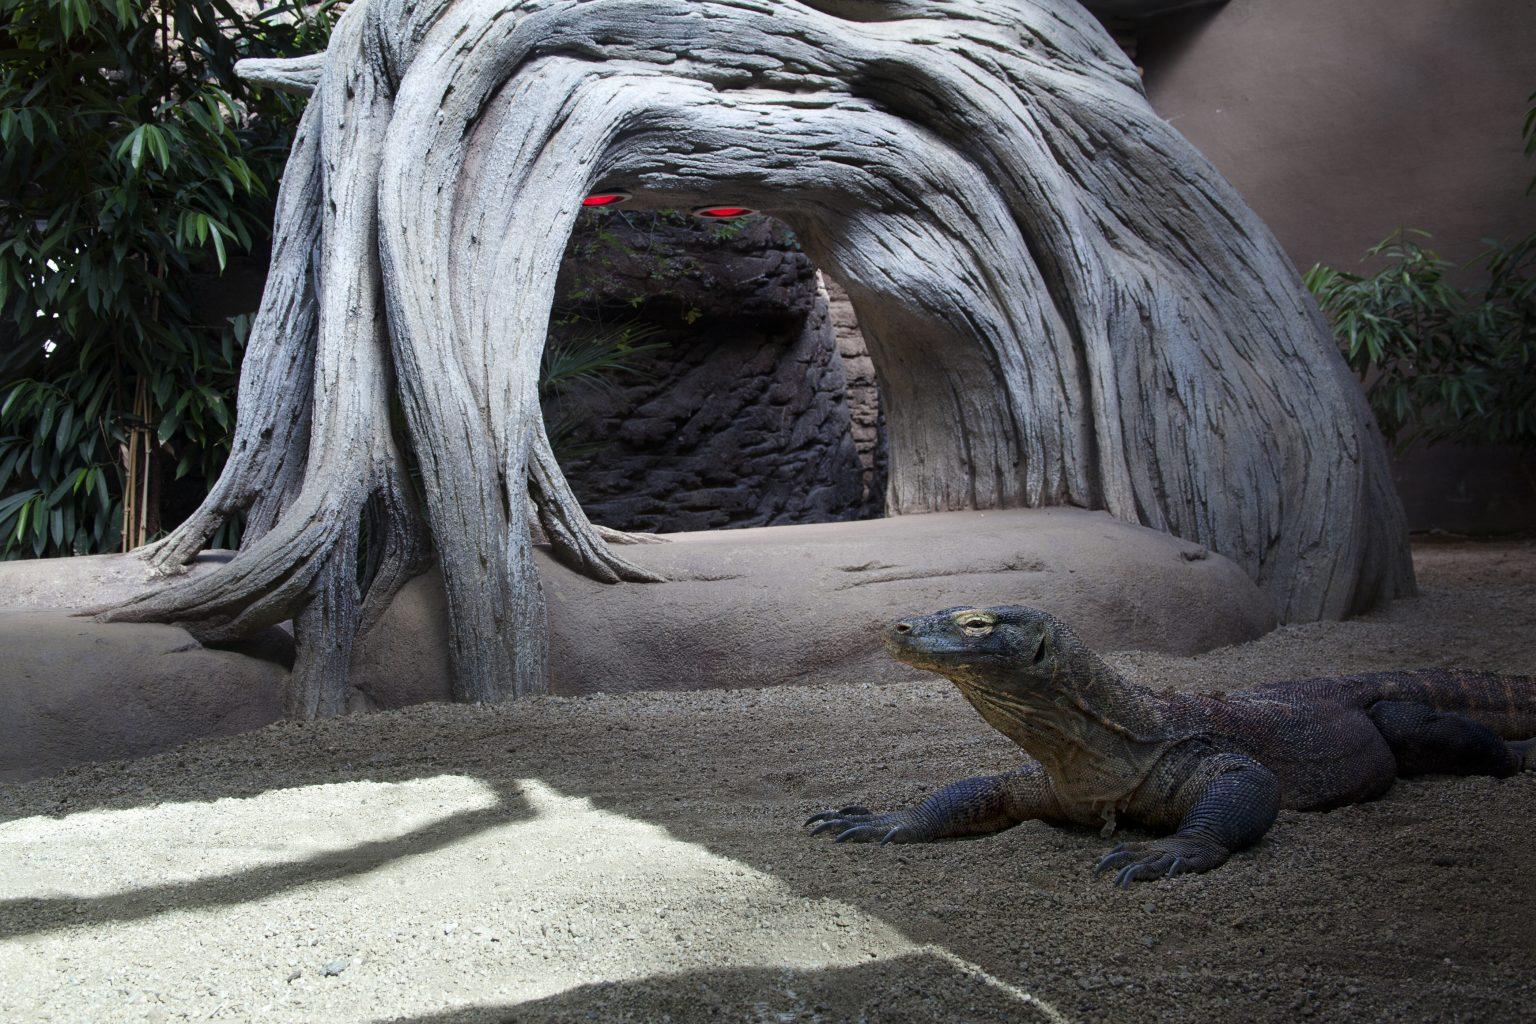 Barcelona, May 2013 - zoological garden, Komodo dragon. >< Barcellona, maggio 2013 - giardino zoologico, drago di Komodo.